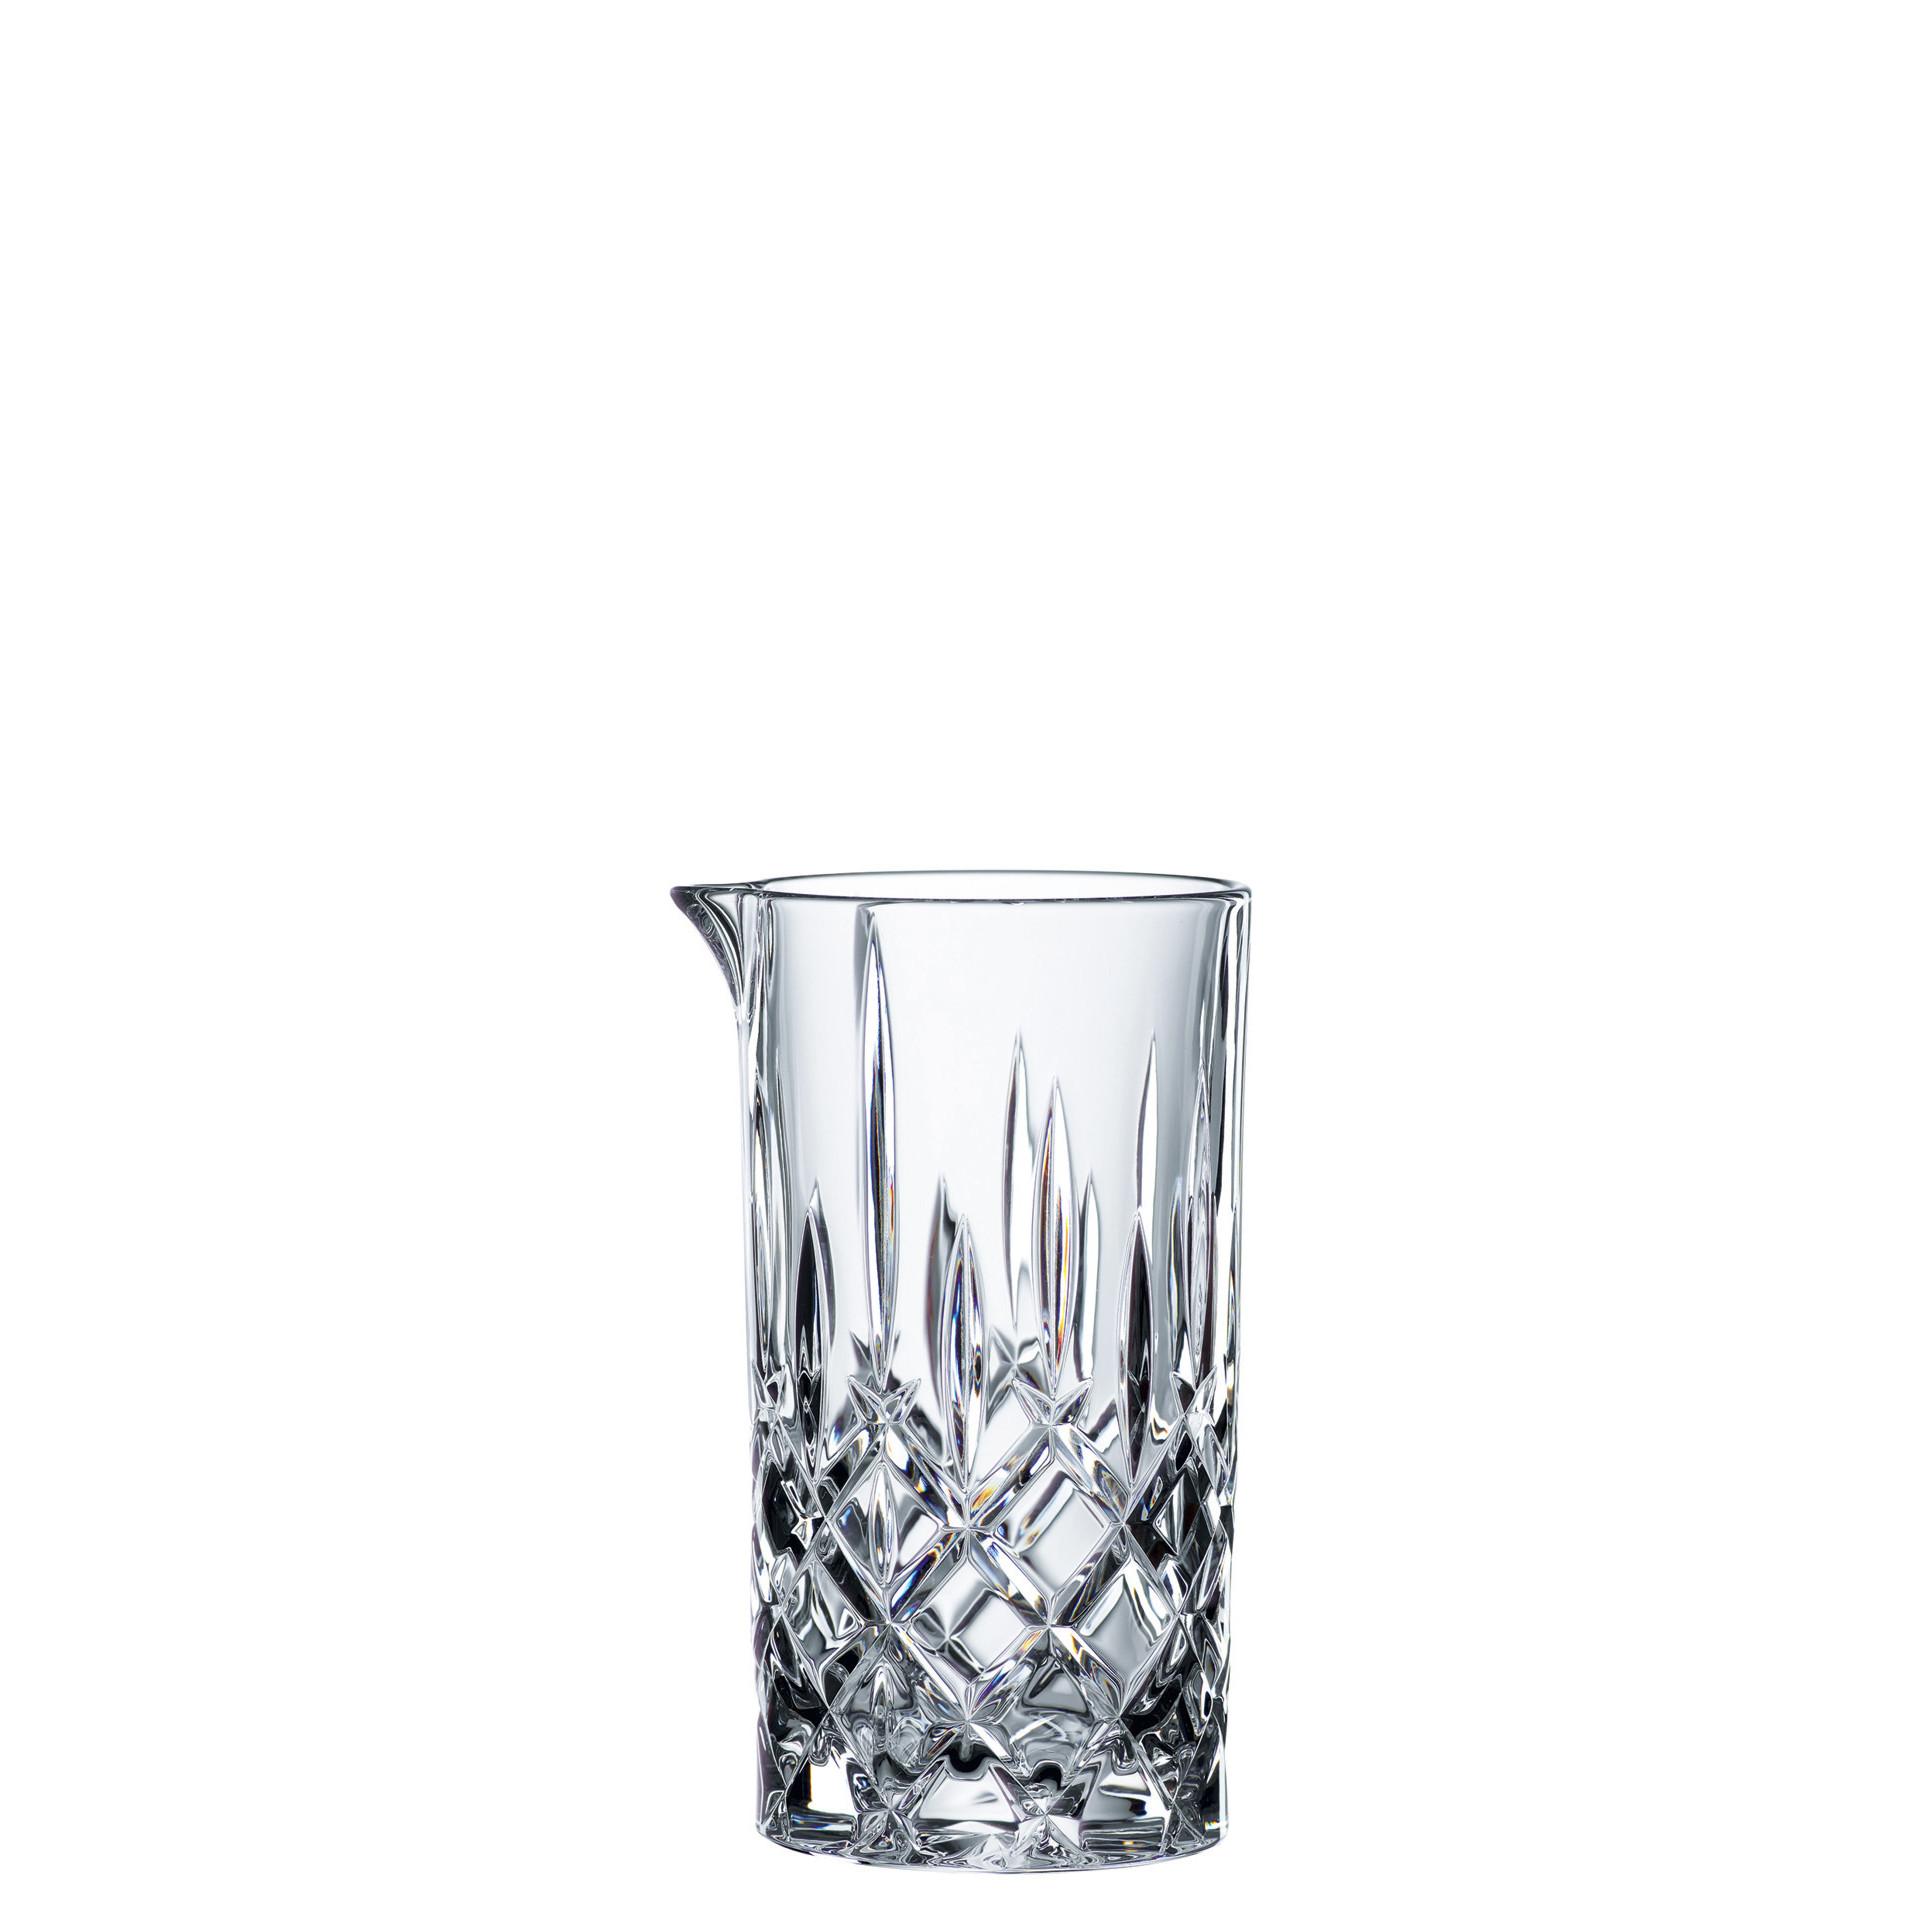 Noblesse, Rührglas ø 106 mm / 0,75 l